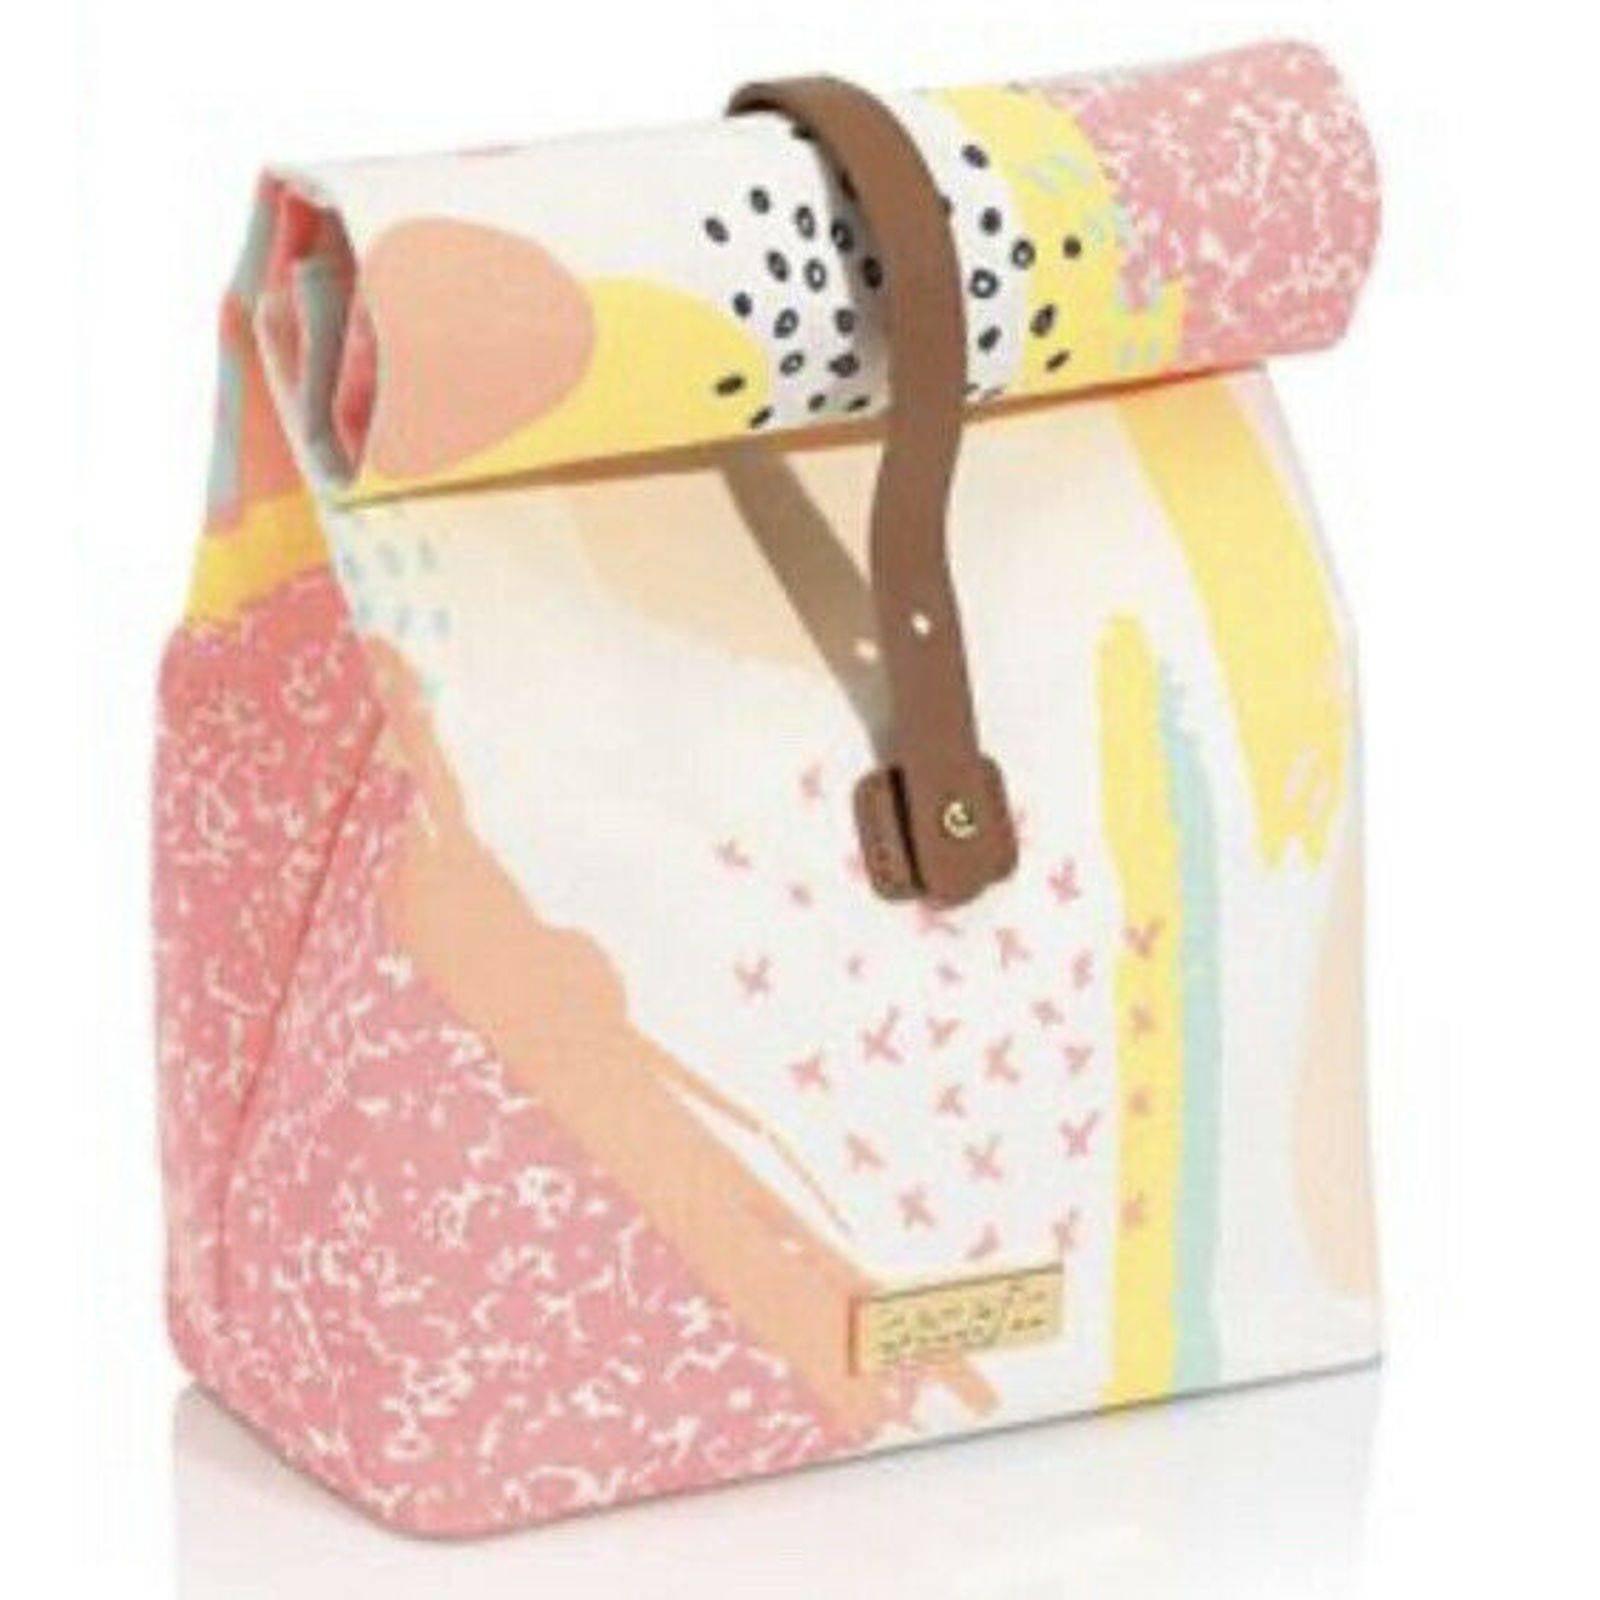 Benefit Cosmetics Fabric Lunch Bag NIP